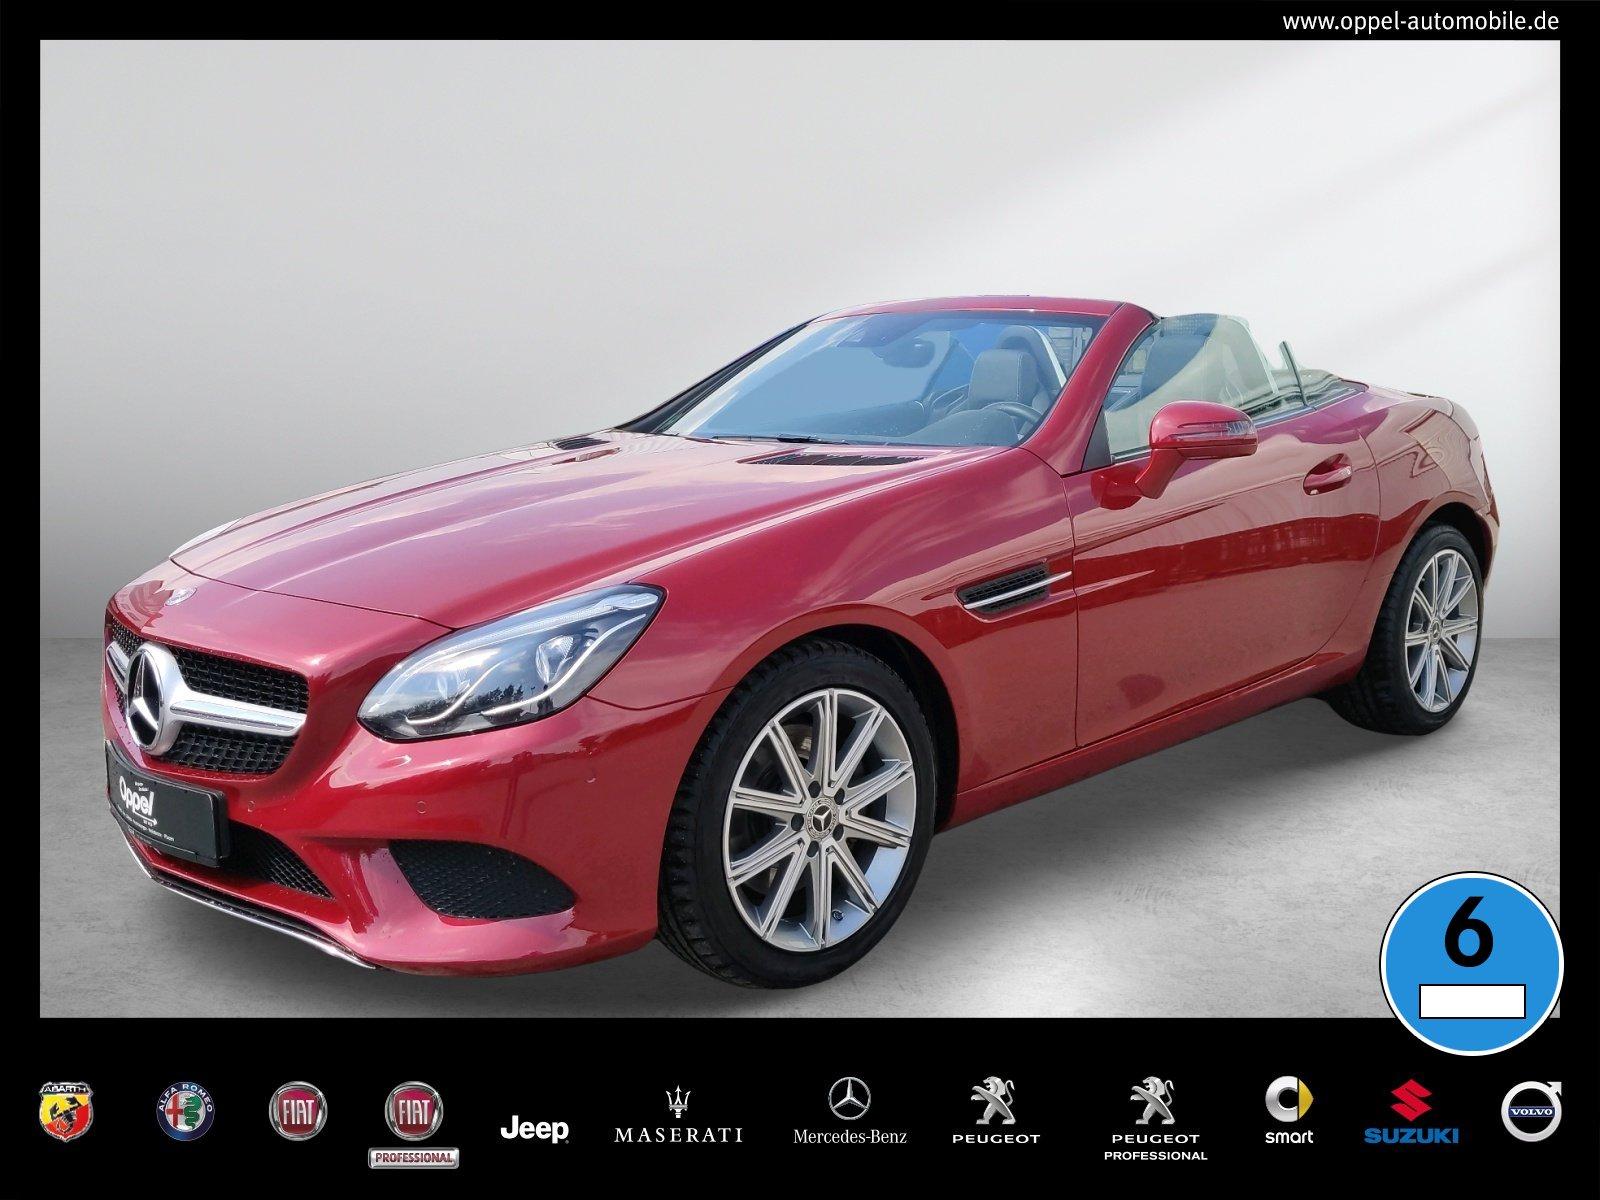 Mercedes-Benz SLC 300 +COMAND+PANORAMA+LED+R-KAMERA+AIRSCARF+, Jahr 2019, Benzin